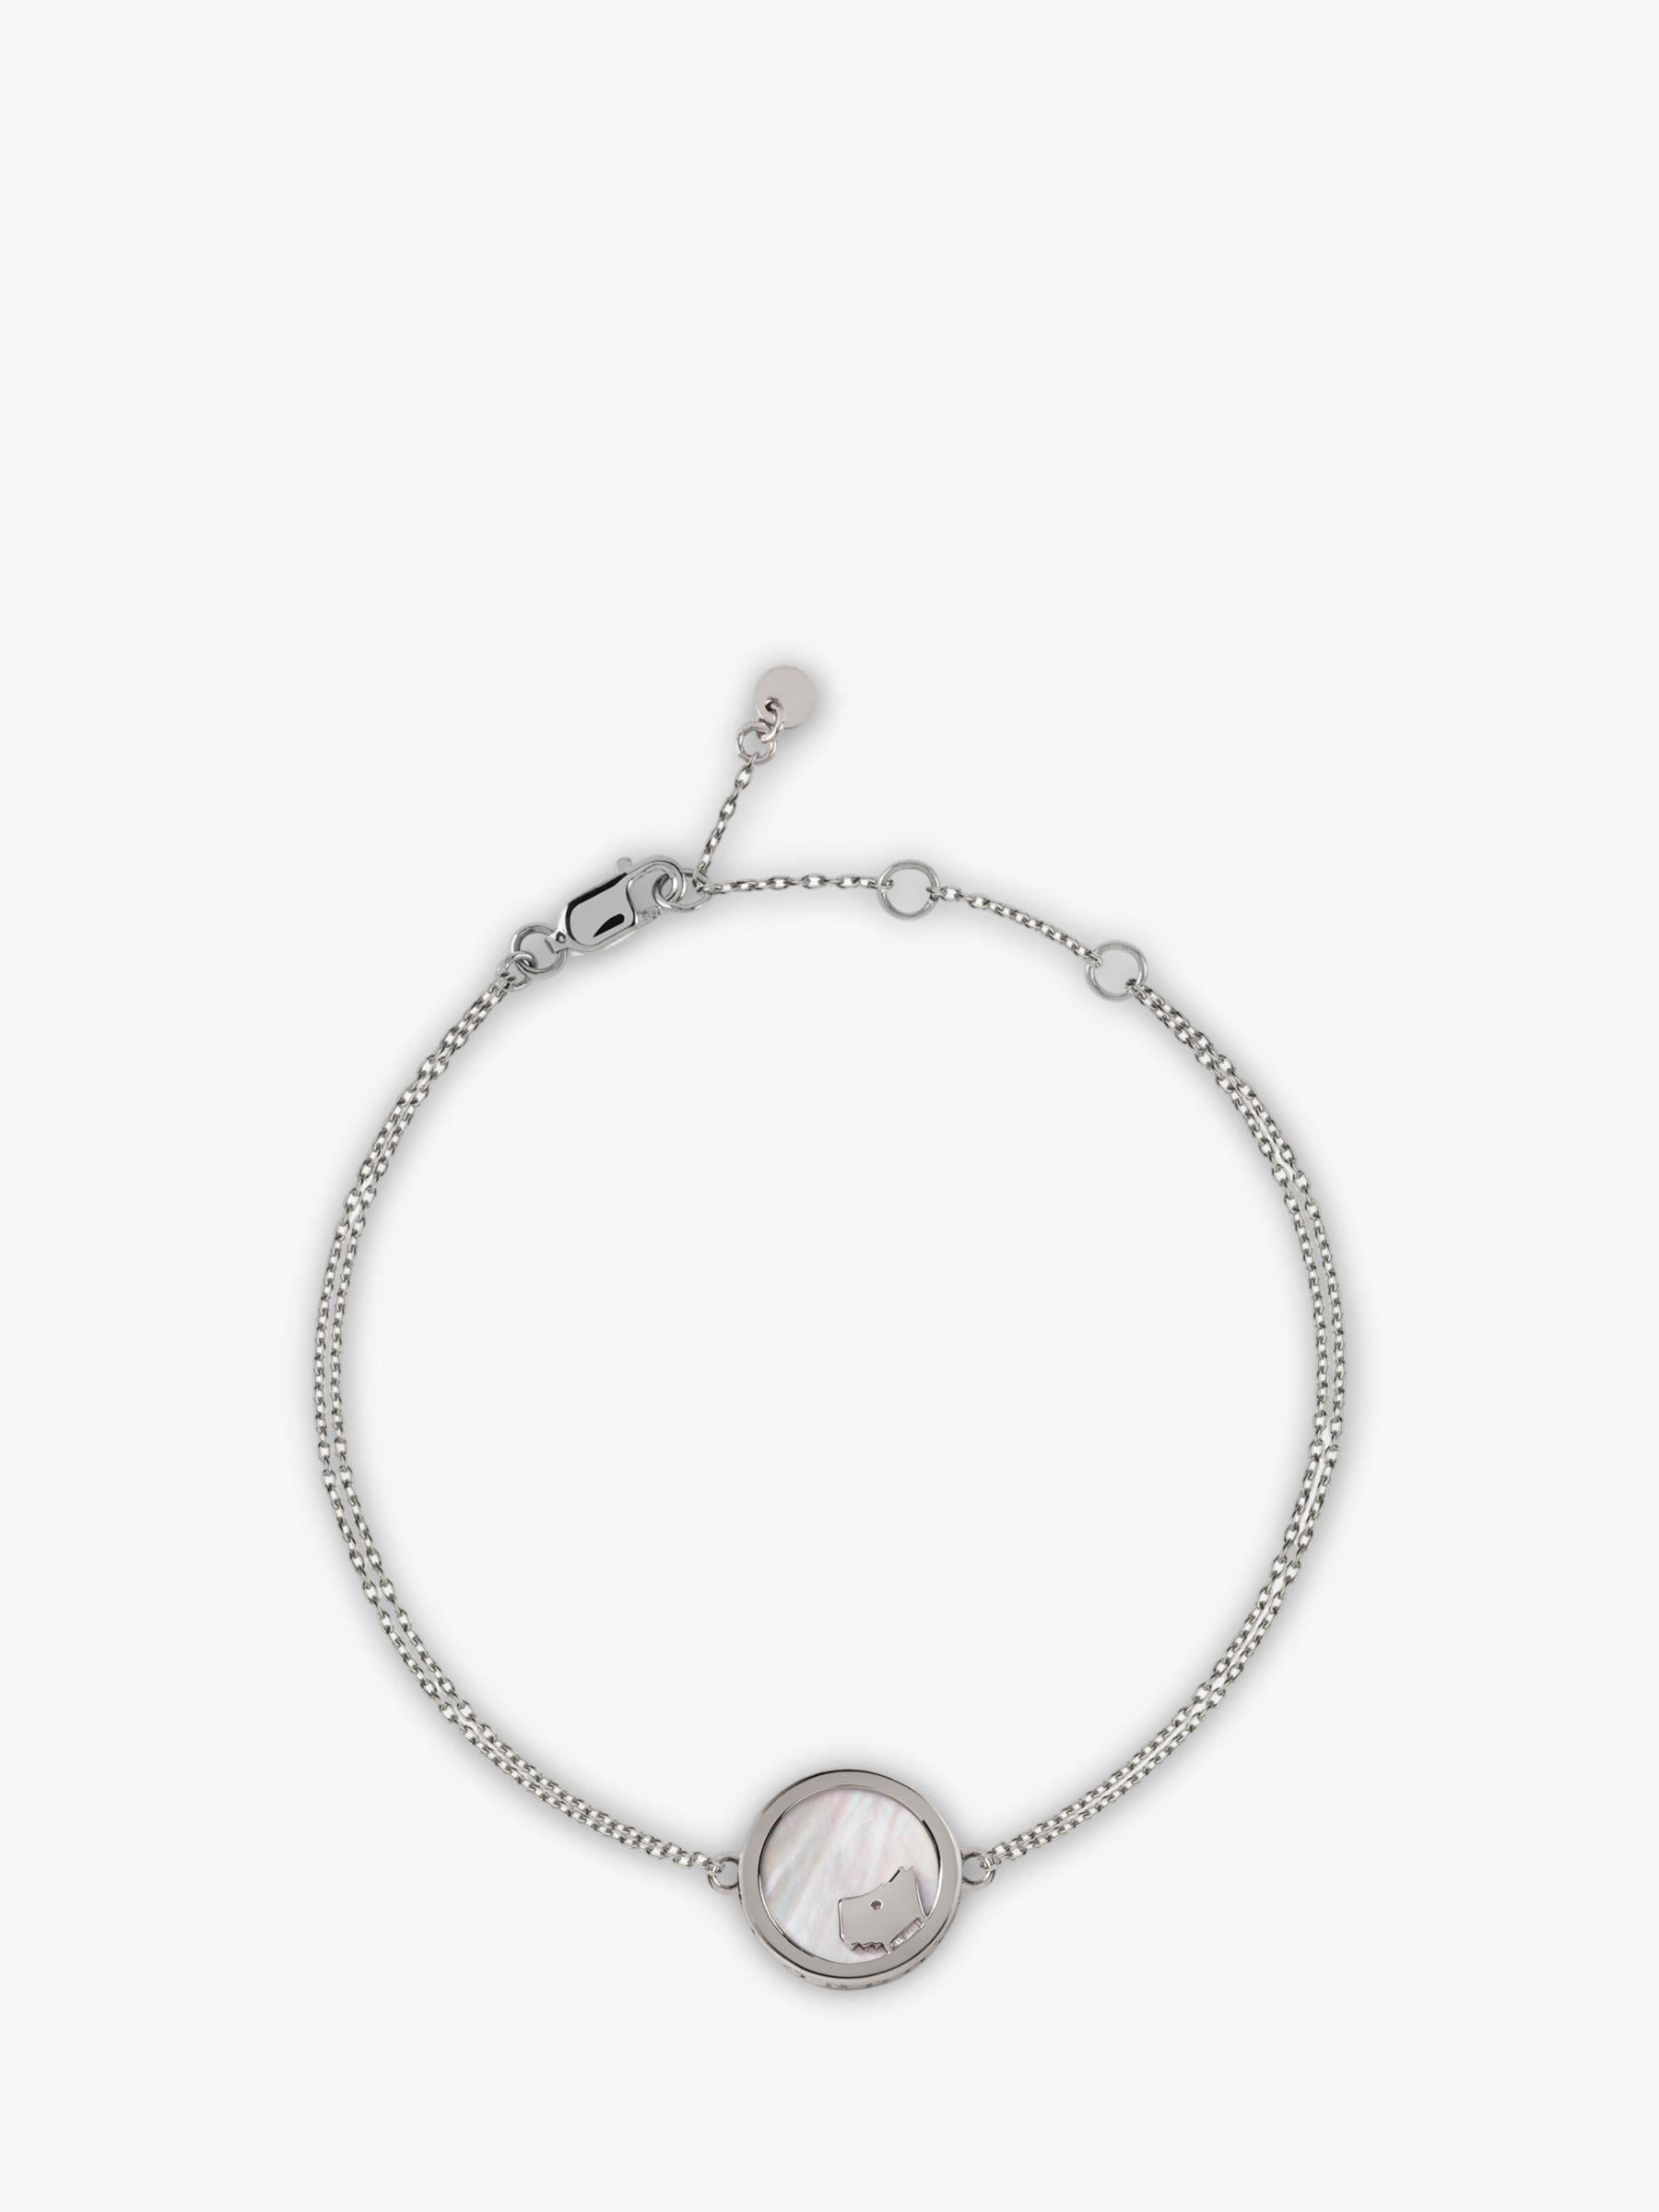 Radley Radley Love Radley Dog Mother Of Pearl Double Chain Bracelet, Silver